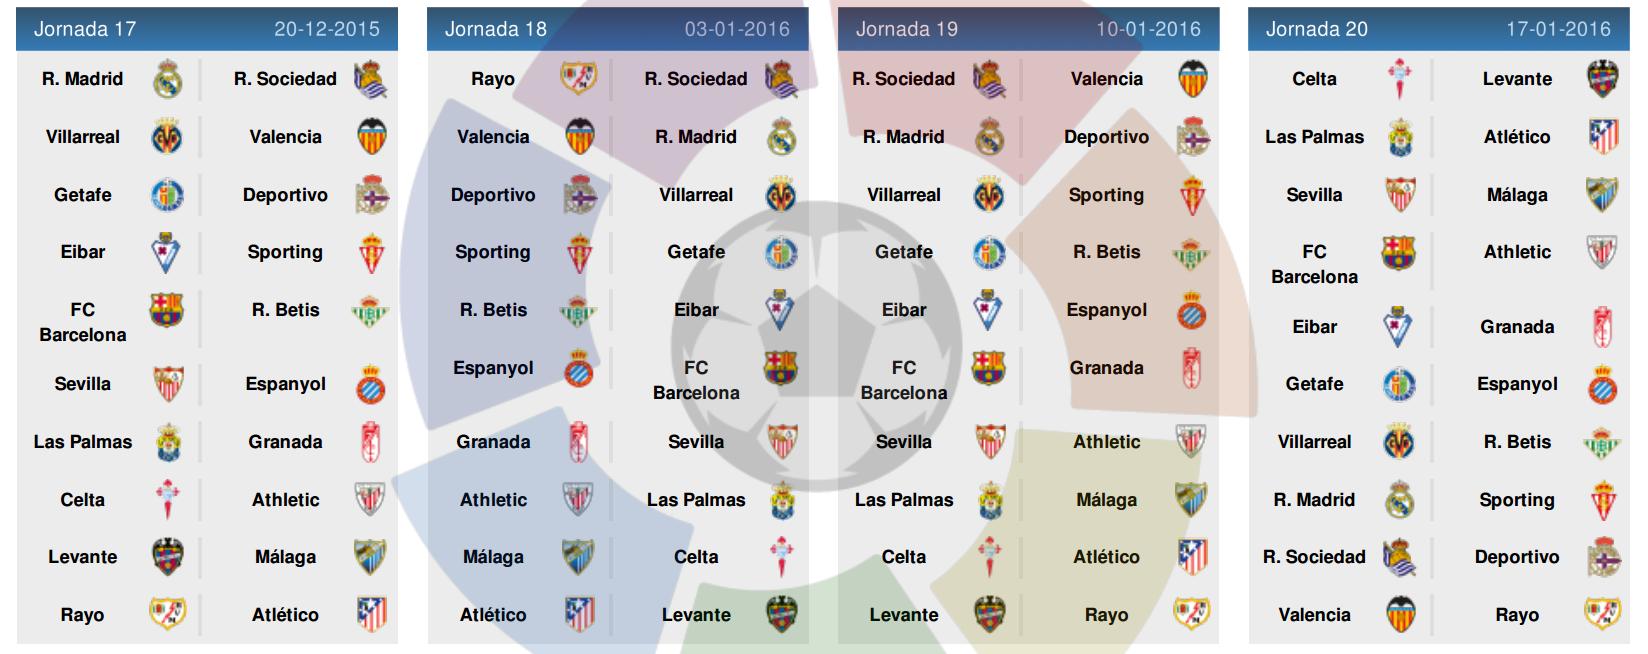 Jadwal Liga Spanyol 2015-2016 5